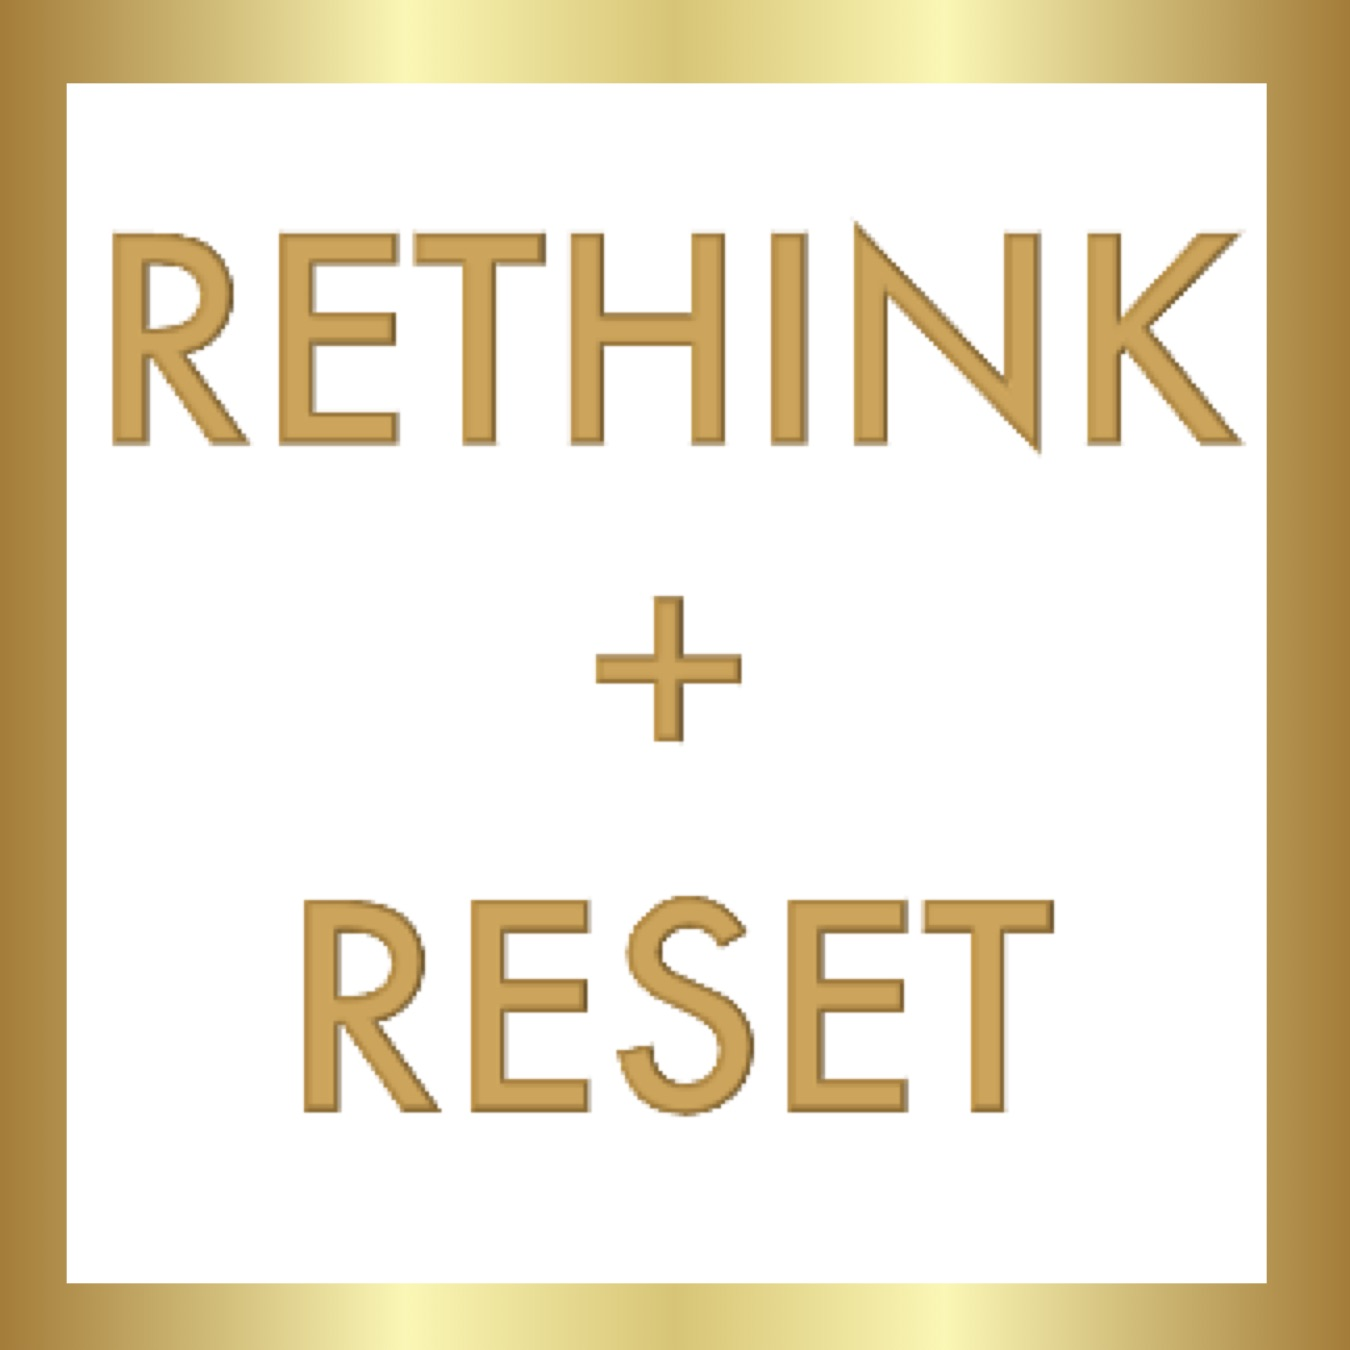 Rethink + Reset